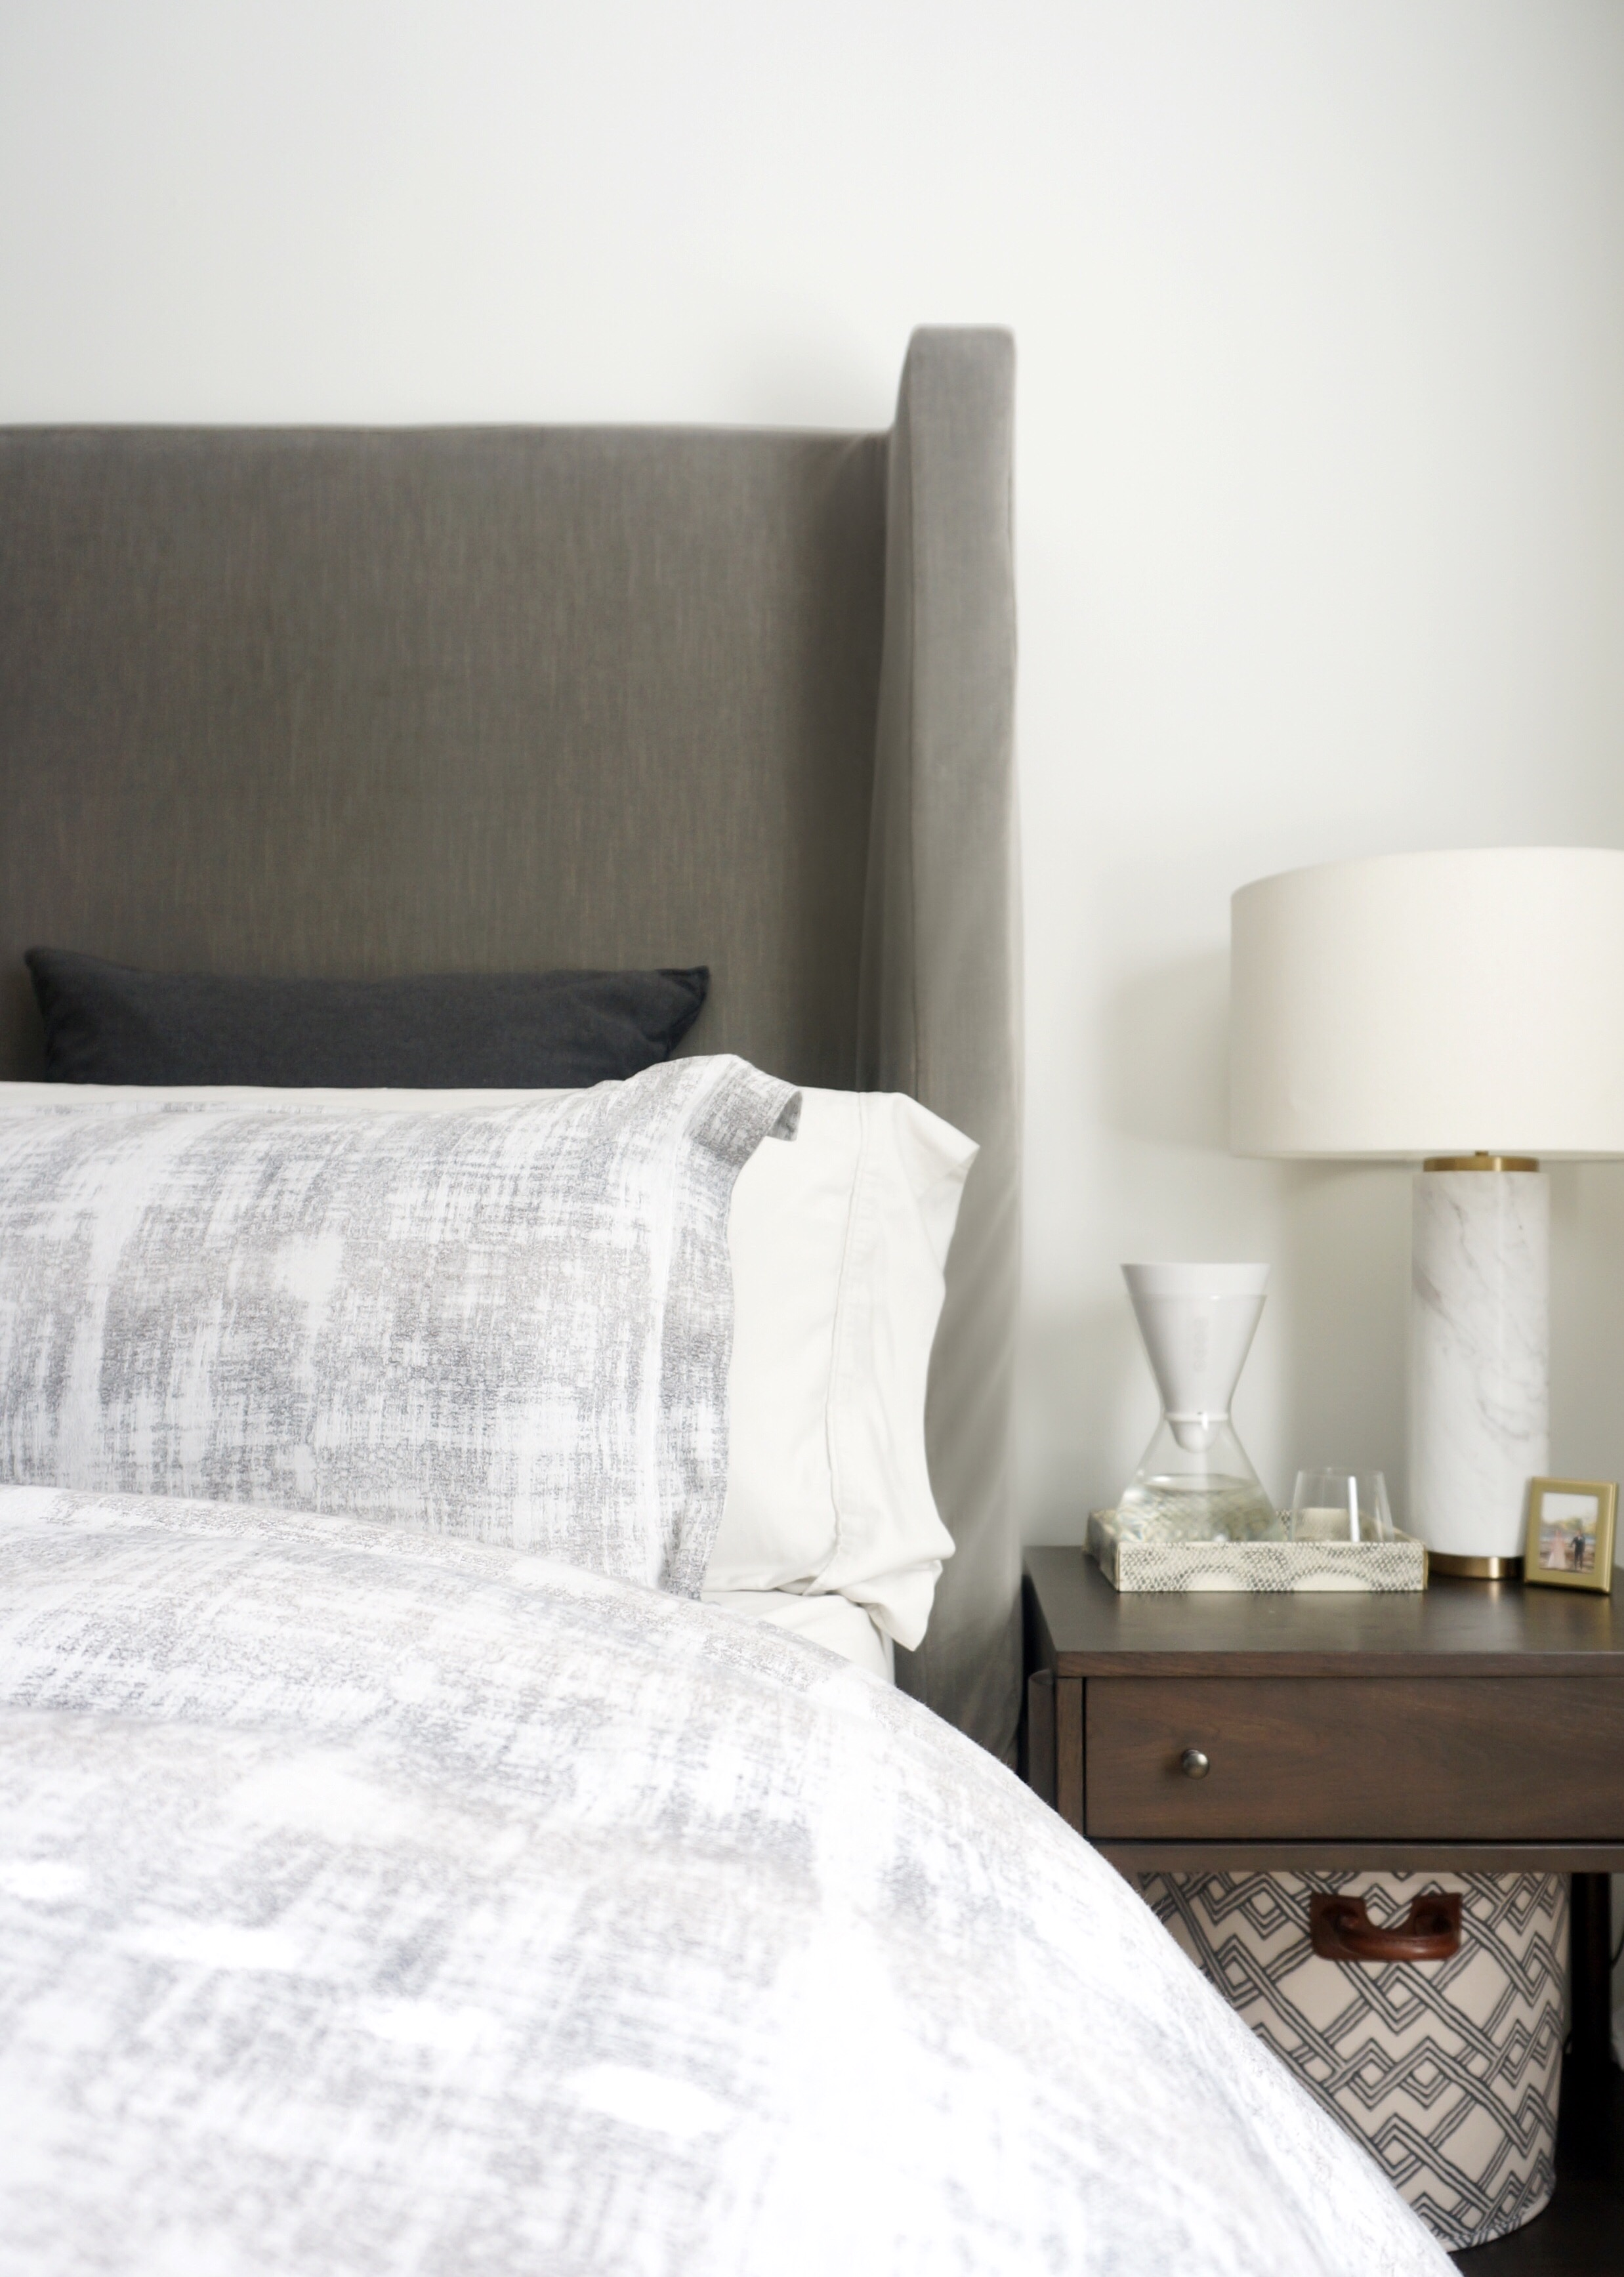 Studio-Chu-Apartment-17-Bedroom-1.jpg